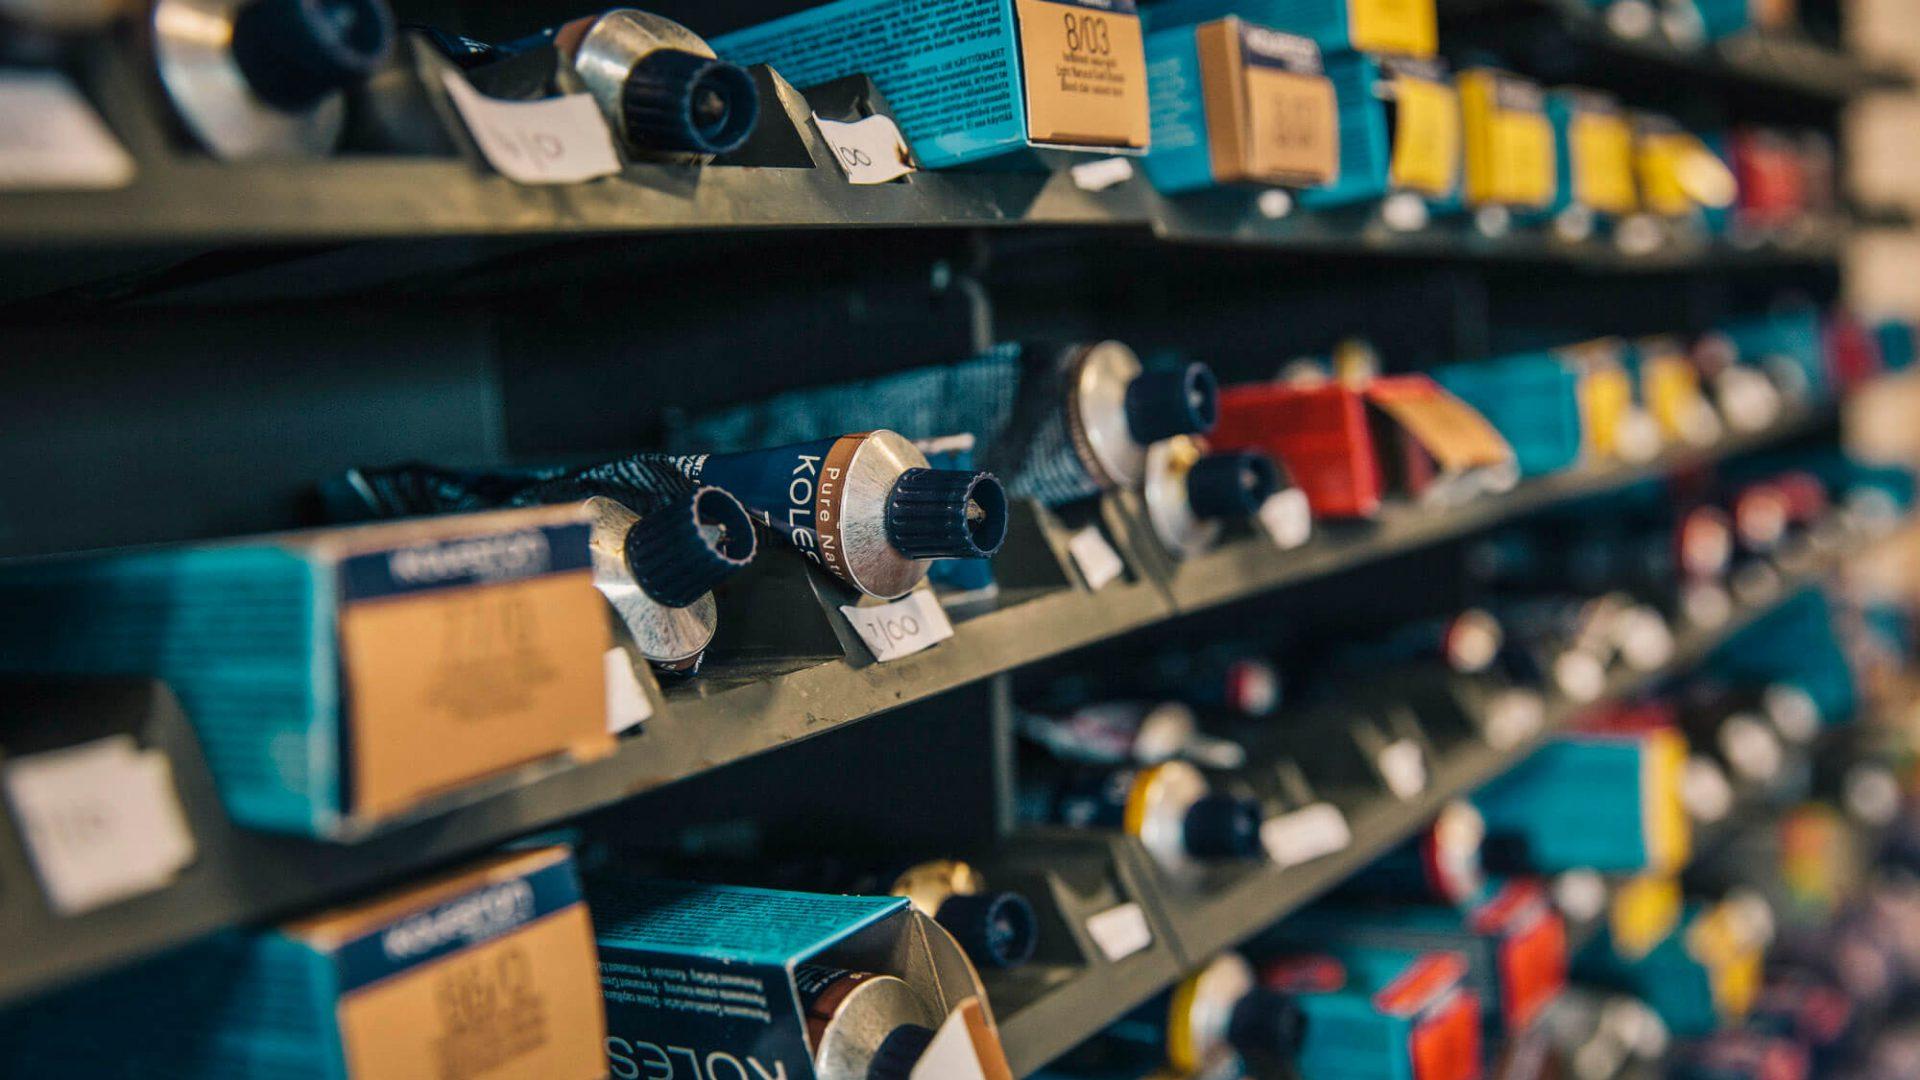 Shelf full of equipment for engineering courses